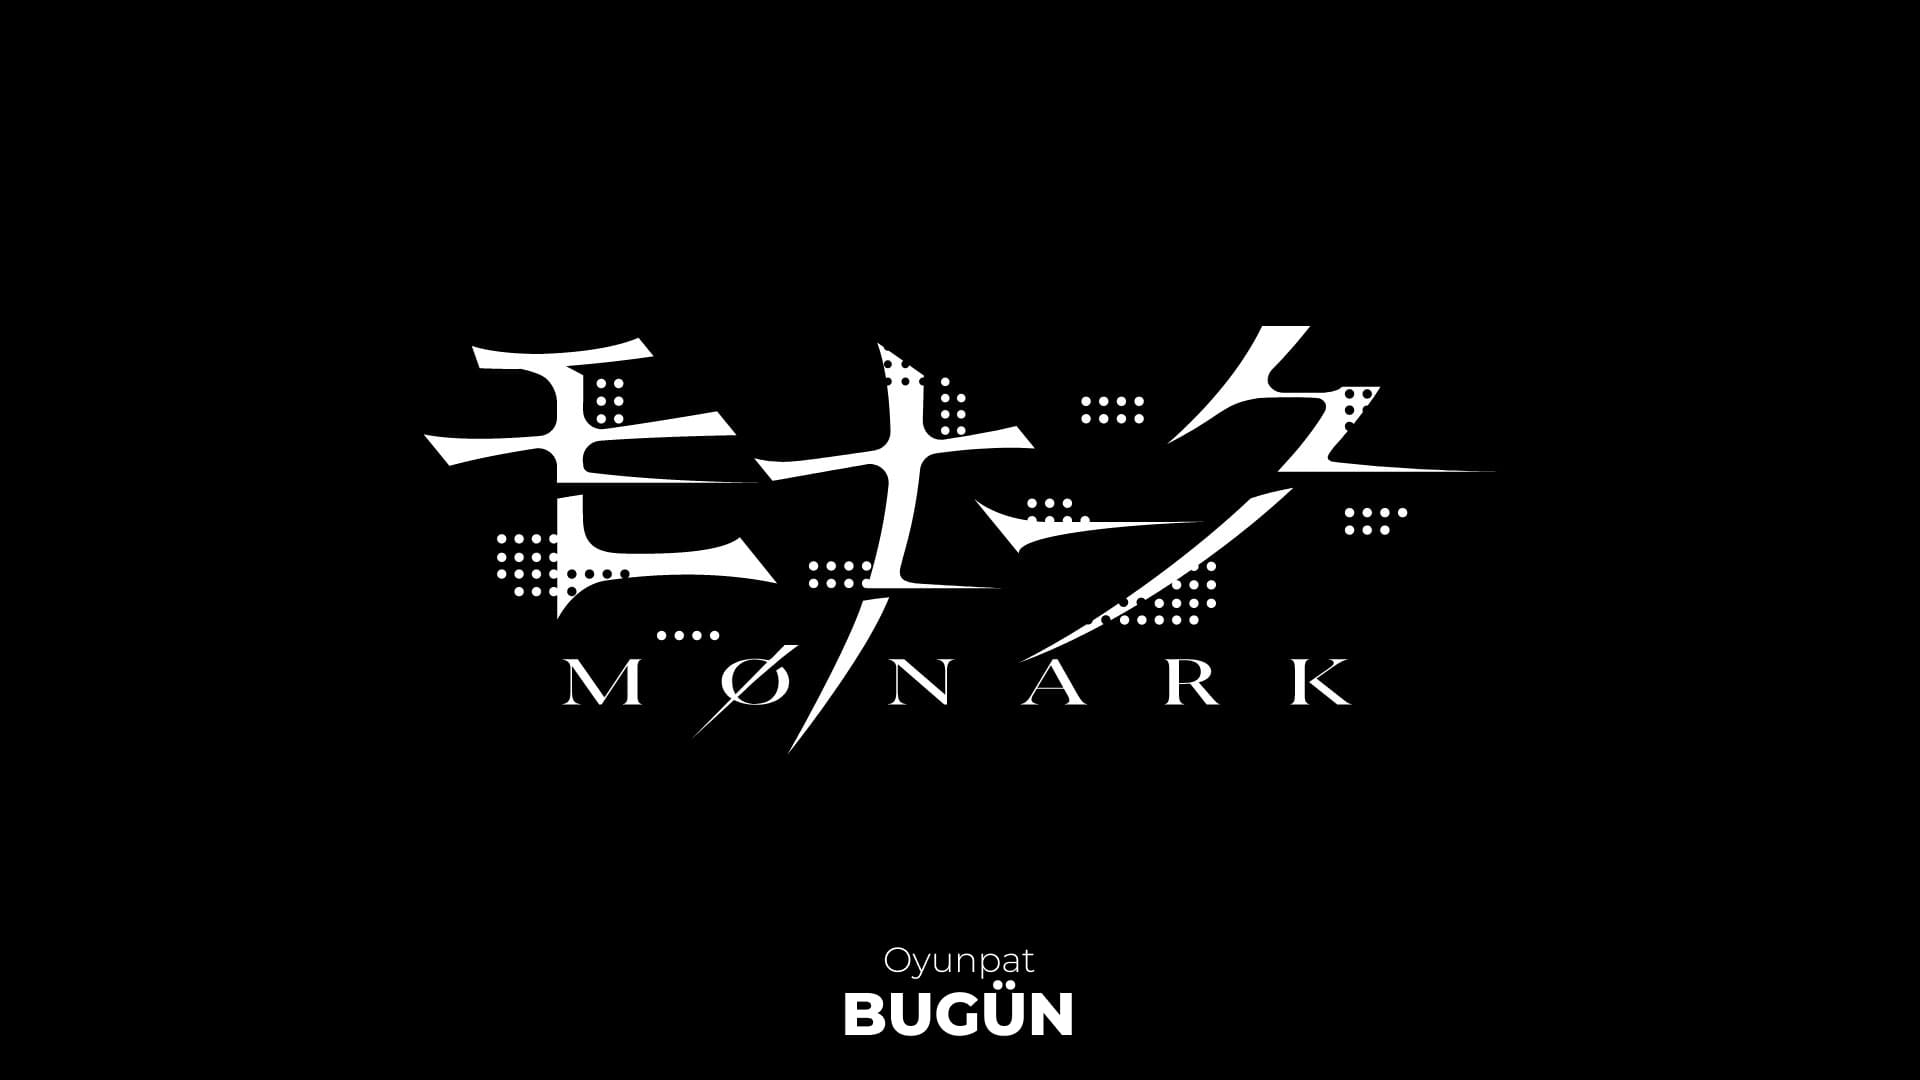 Shin Megami Tensei Monark min-oyunpat